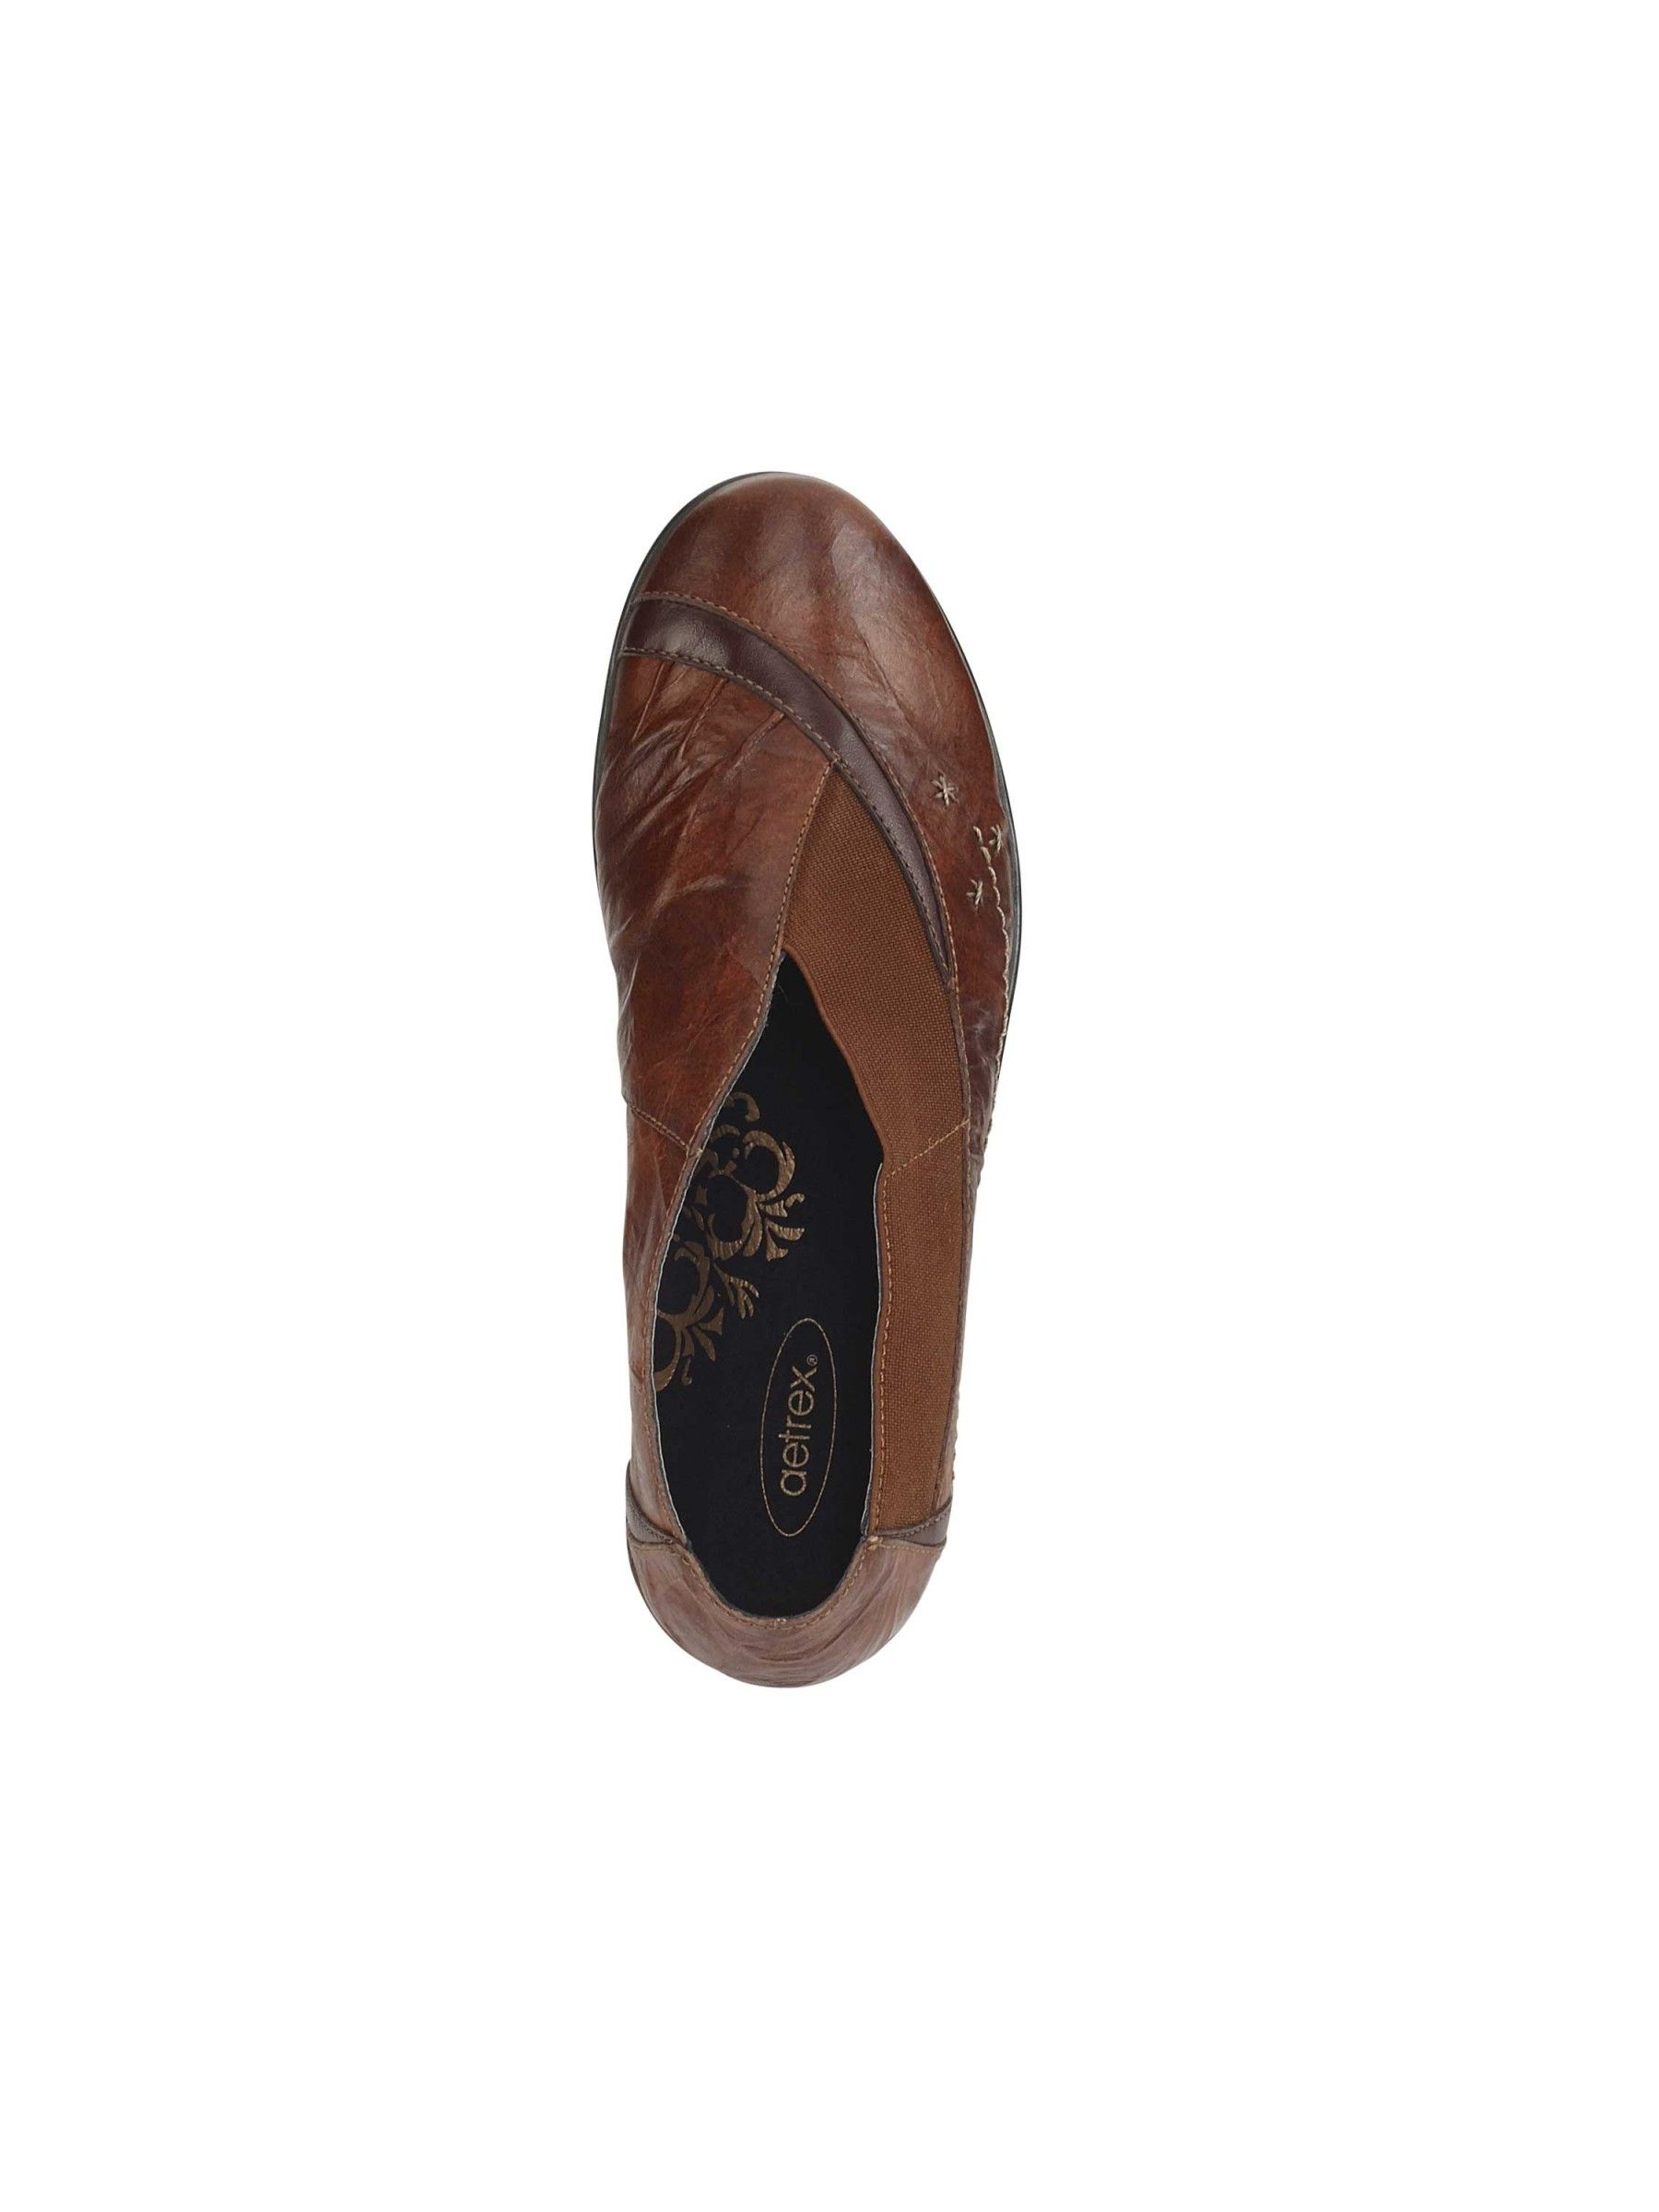 Eva Slip-On Aetrex Shoes, Sandalistas, Aetrex Sandals, Aetrex Orthotics, Orthotics, Lynco -6965